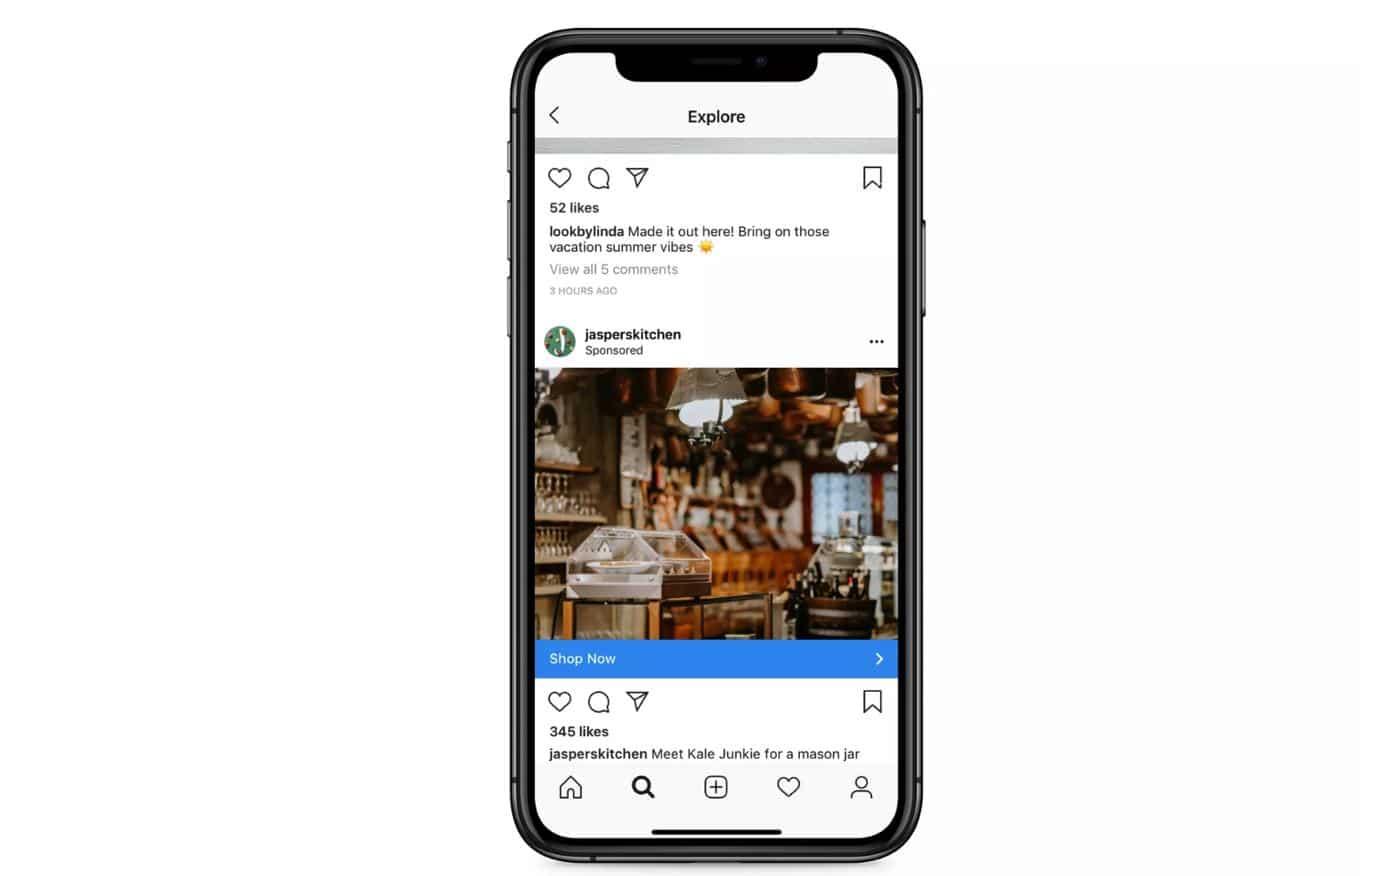 instagram explore page ads